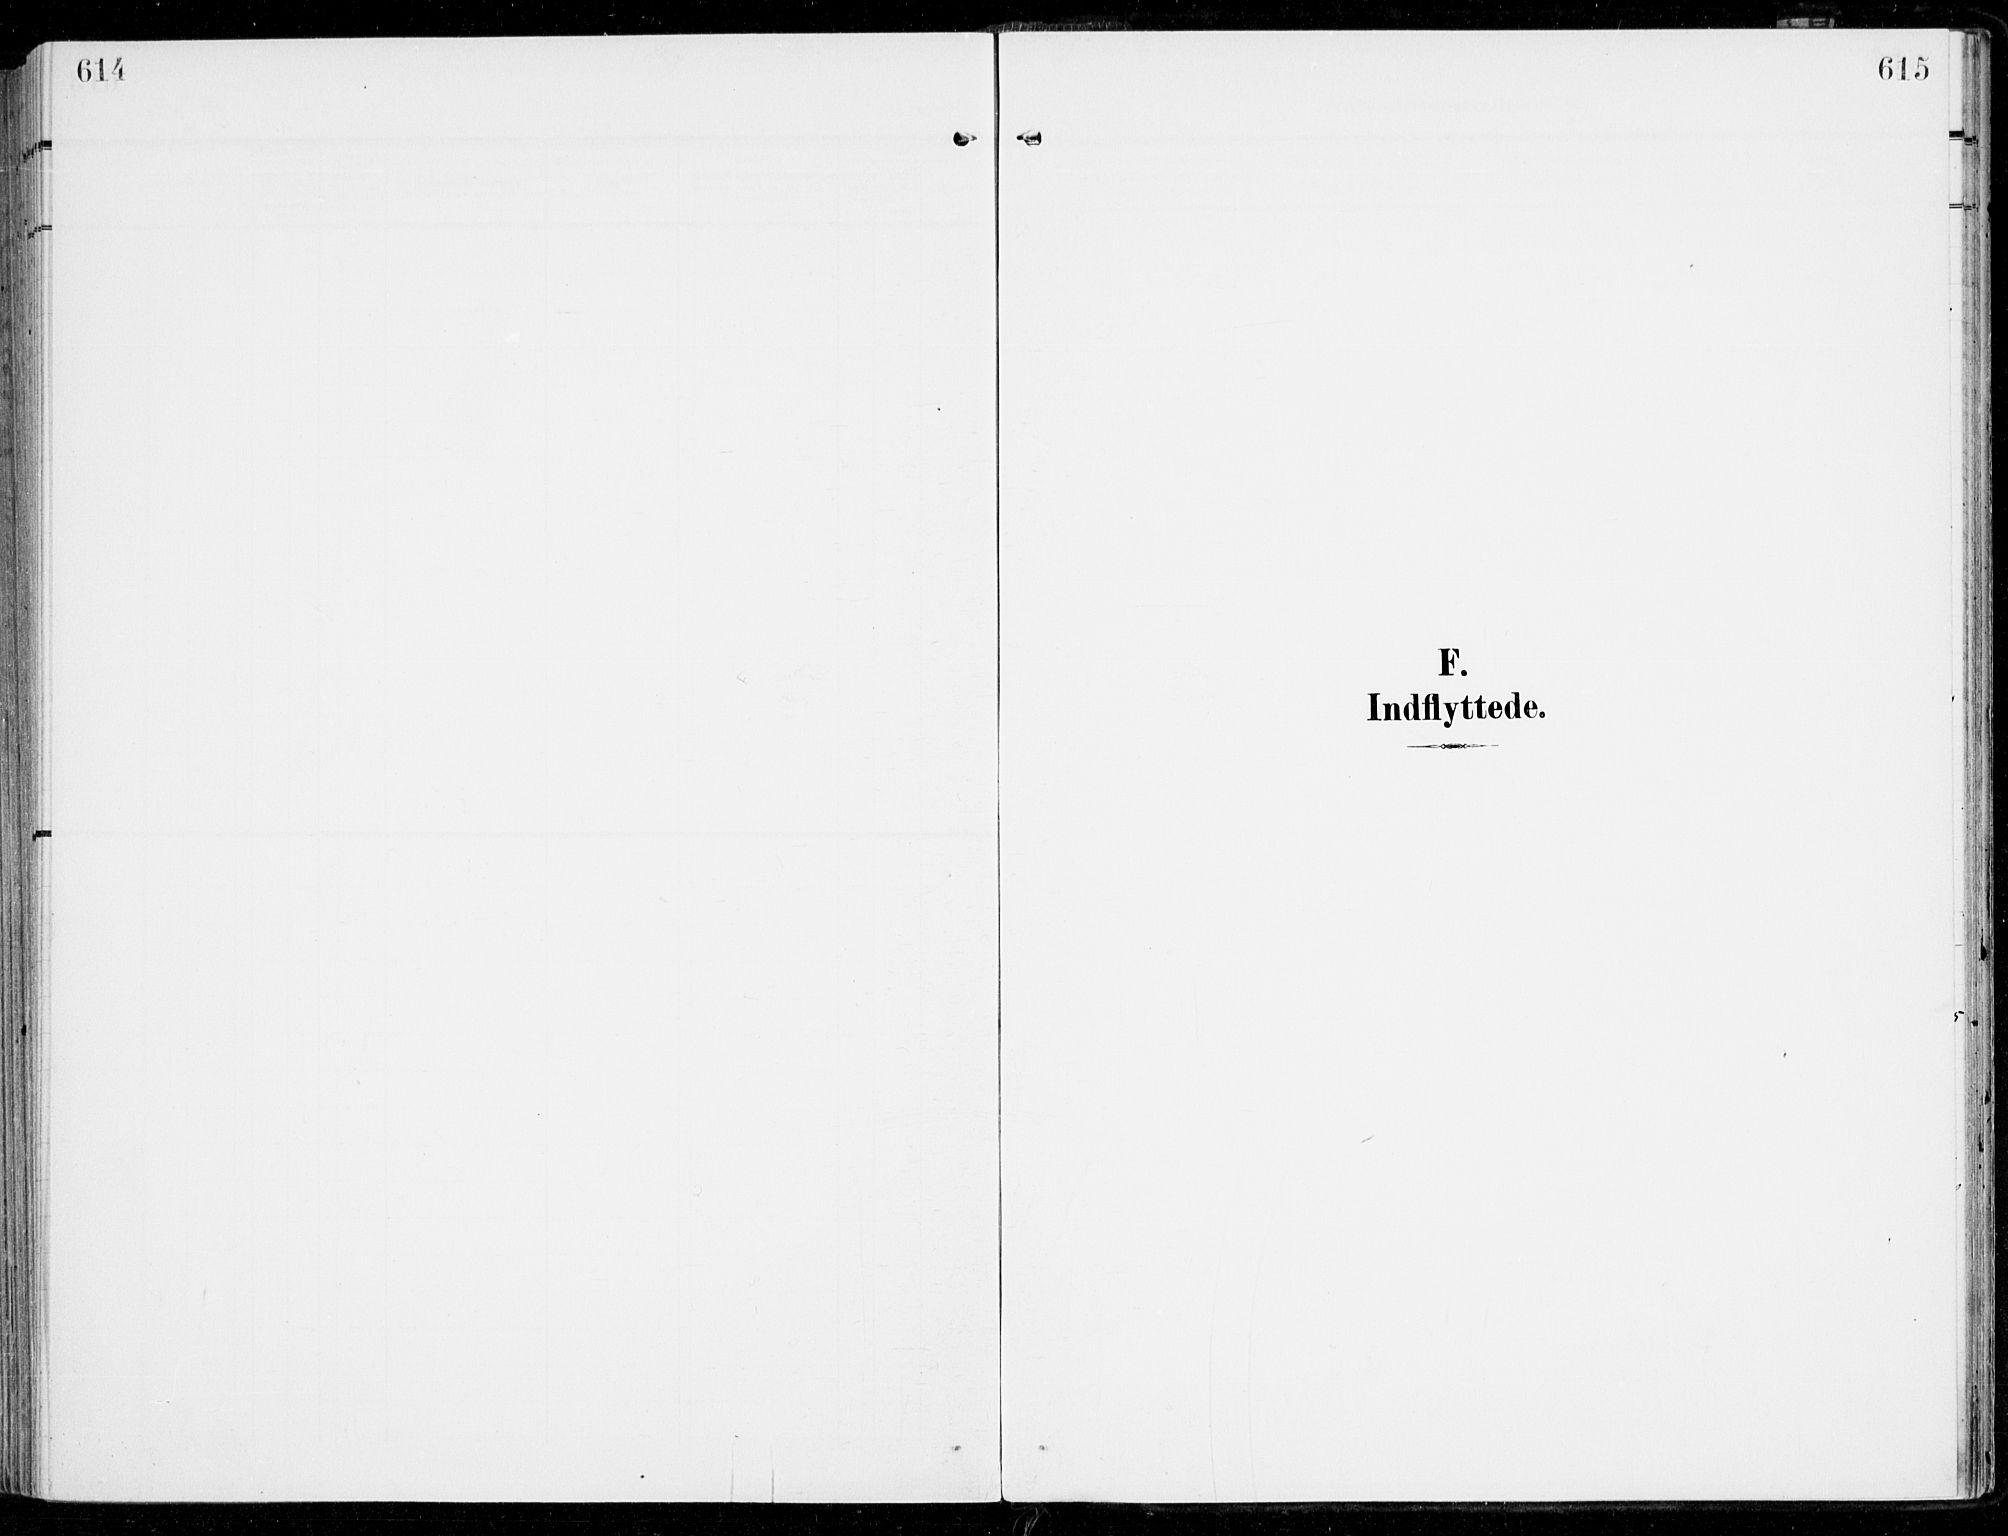 SAKO, Sem kirkebøker, F/Fb/L0006: Ministerialbok nr. II 6, 1905-1918, s. 614-615